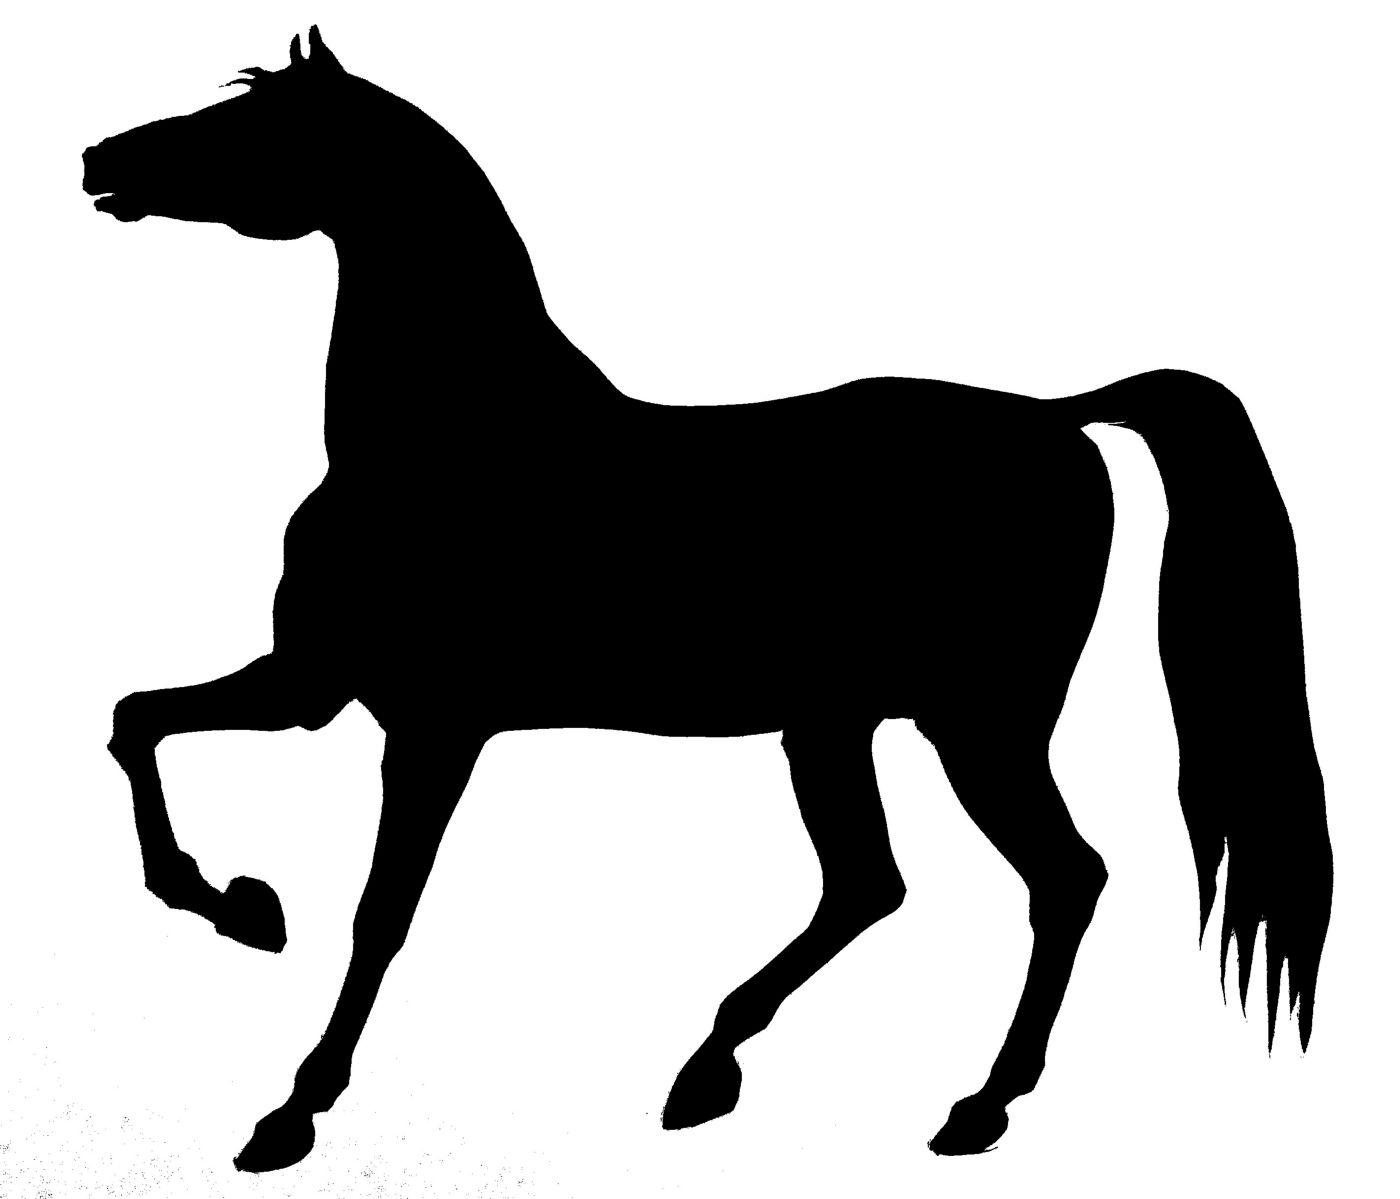 Bucking Horse Images Stock Photos amp Vectors  Shutterstock